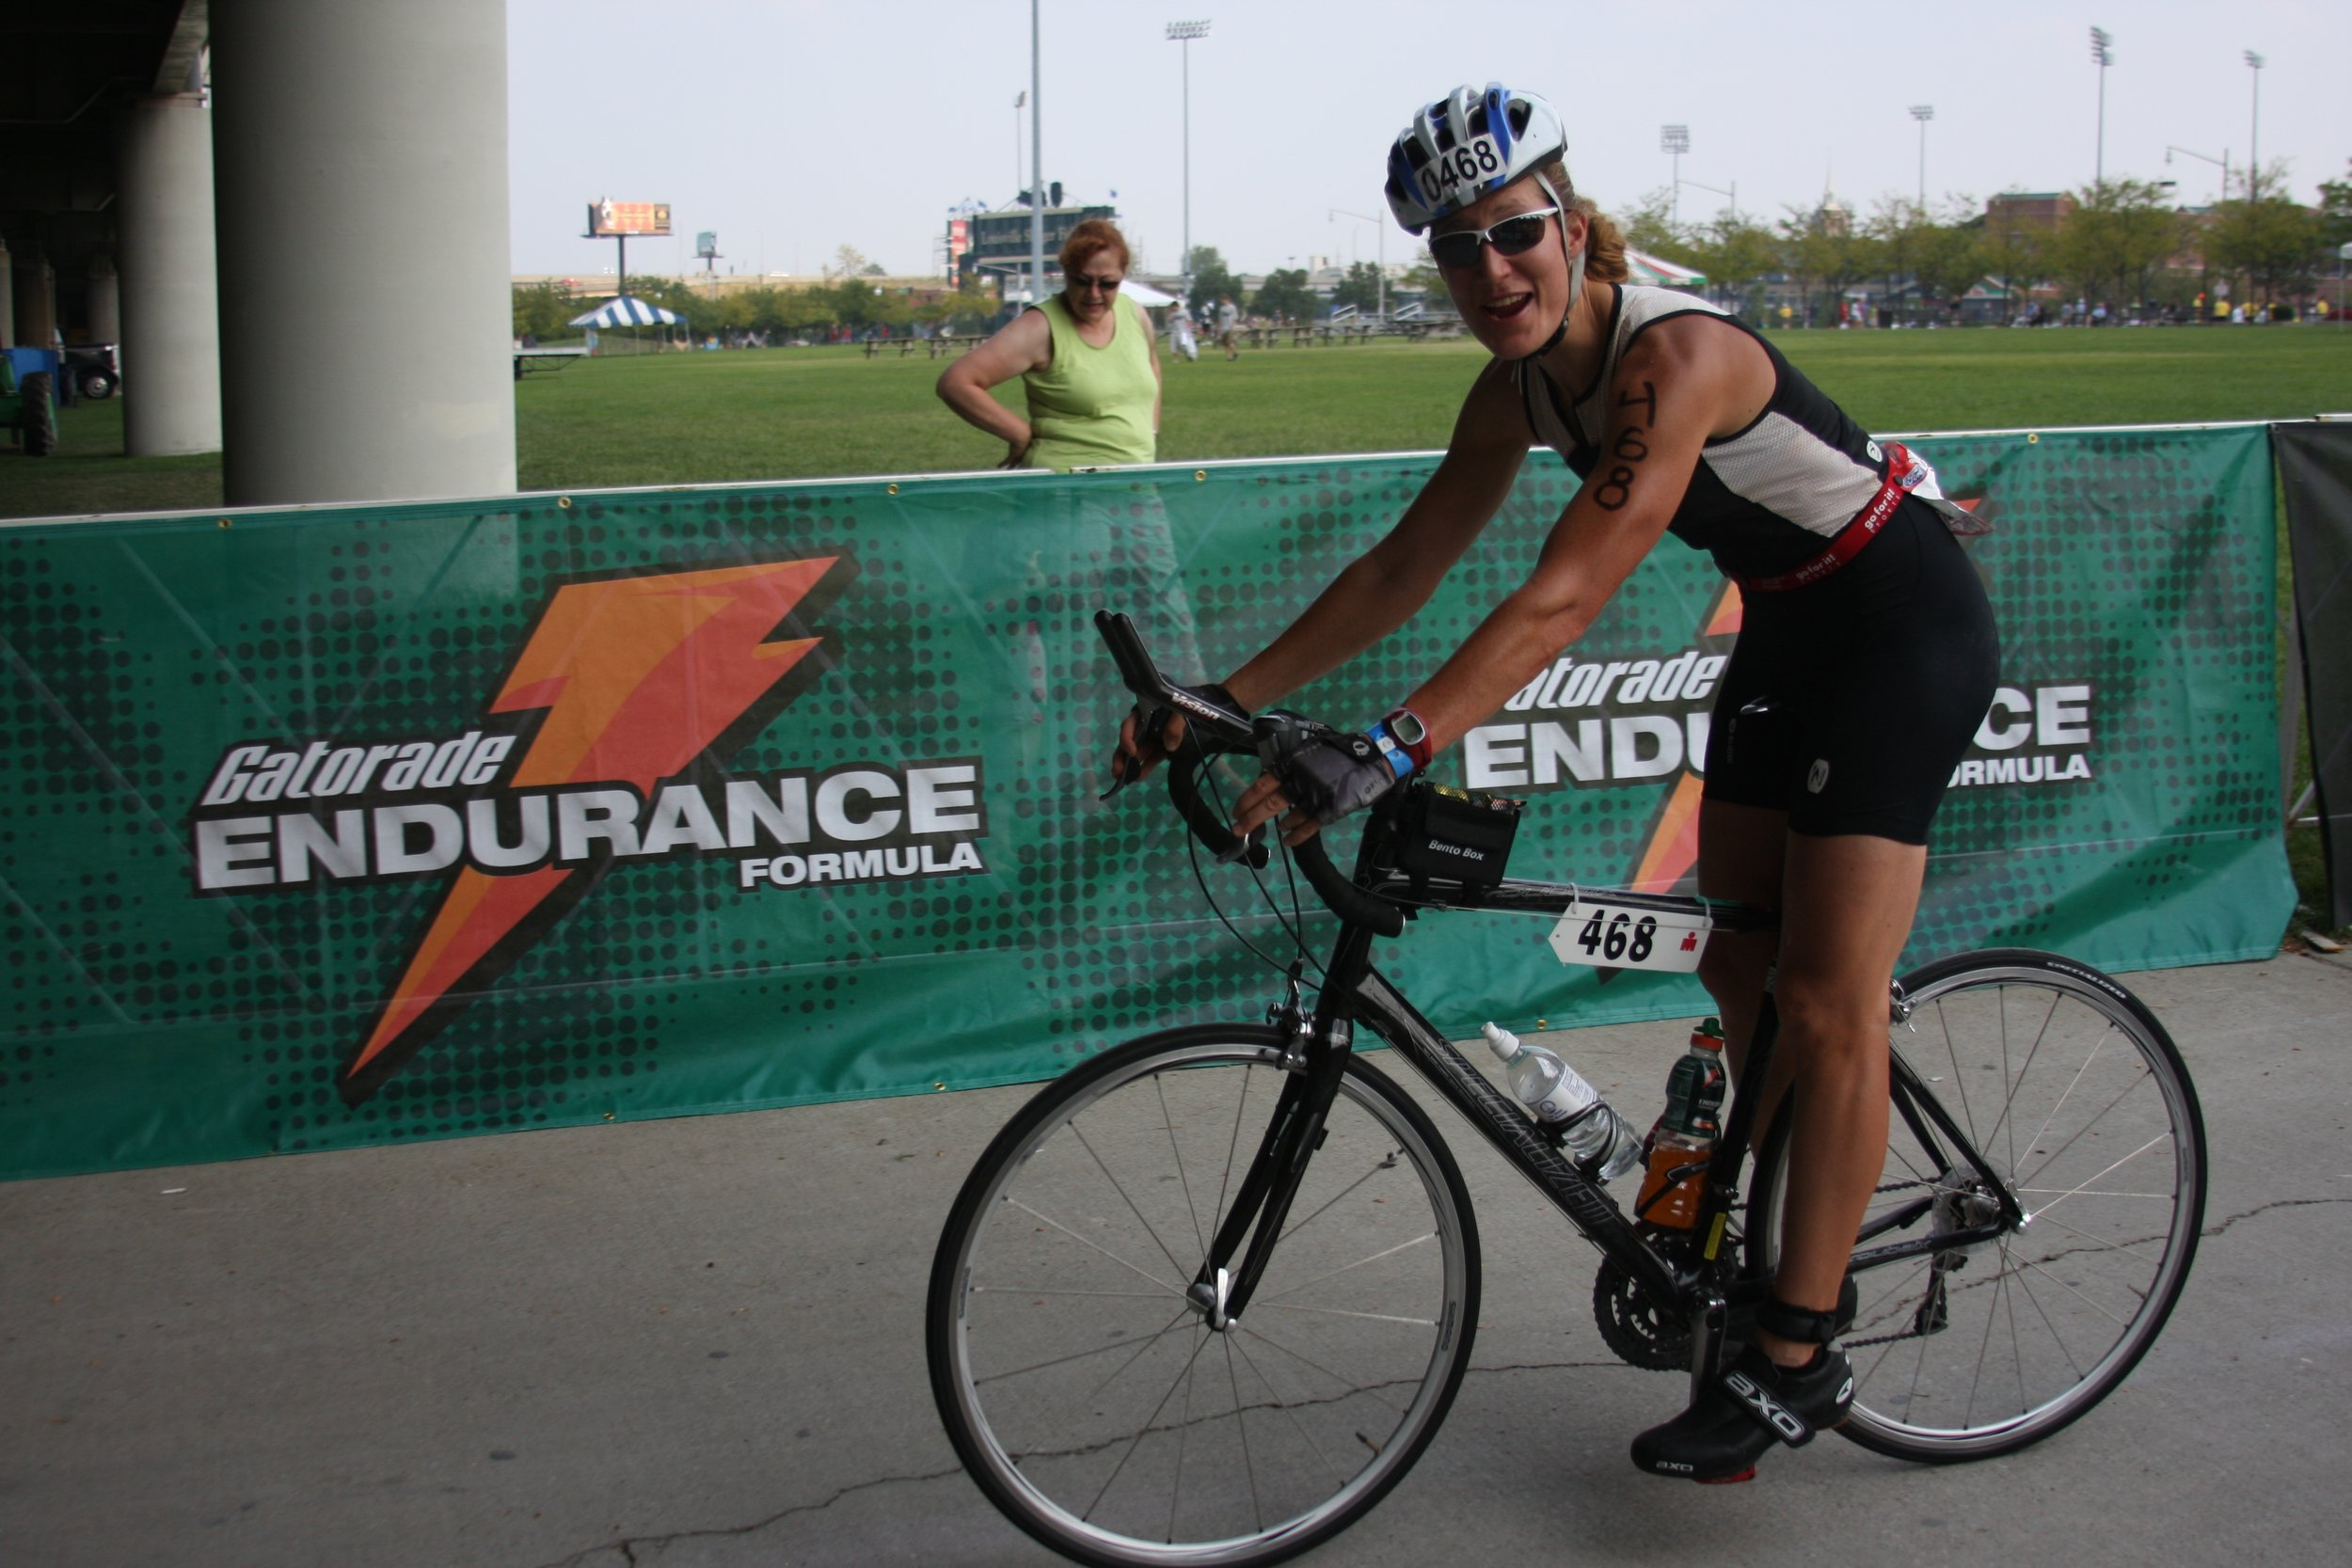 Bike-In from Ironman, Louisville, 2008. Excellent helmet placement.